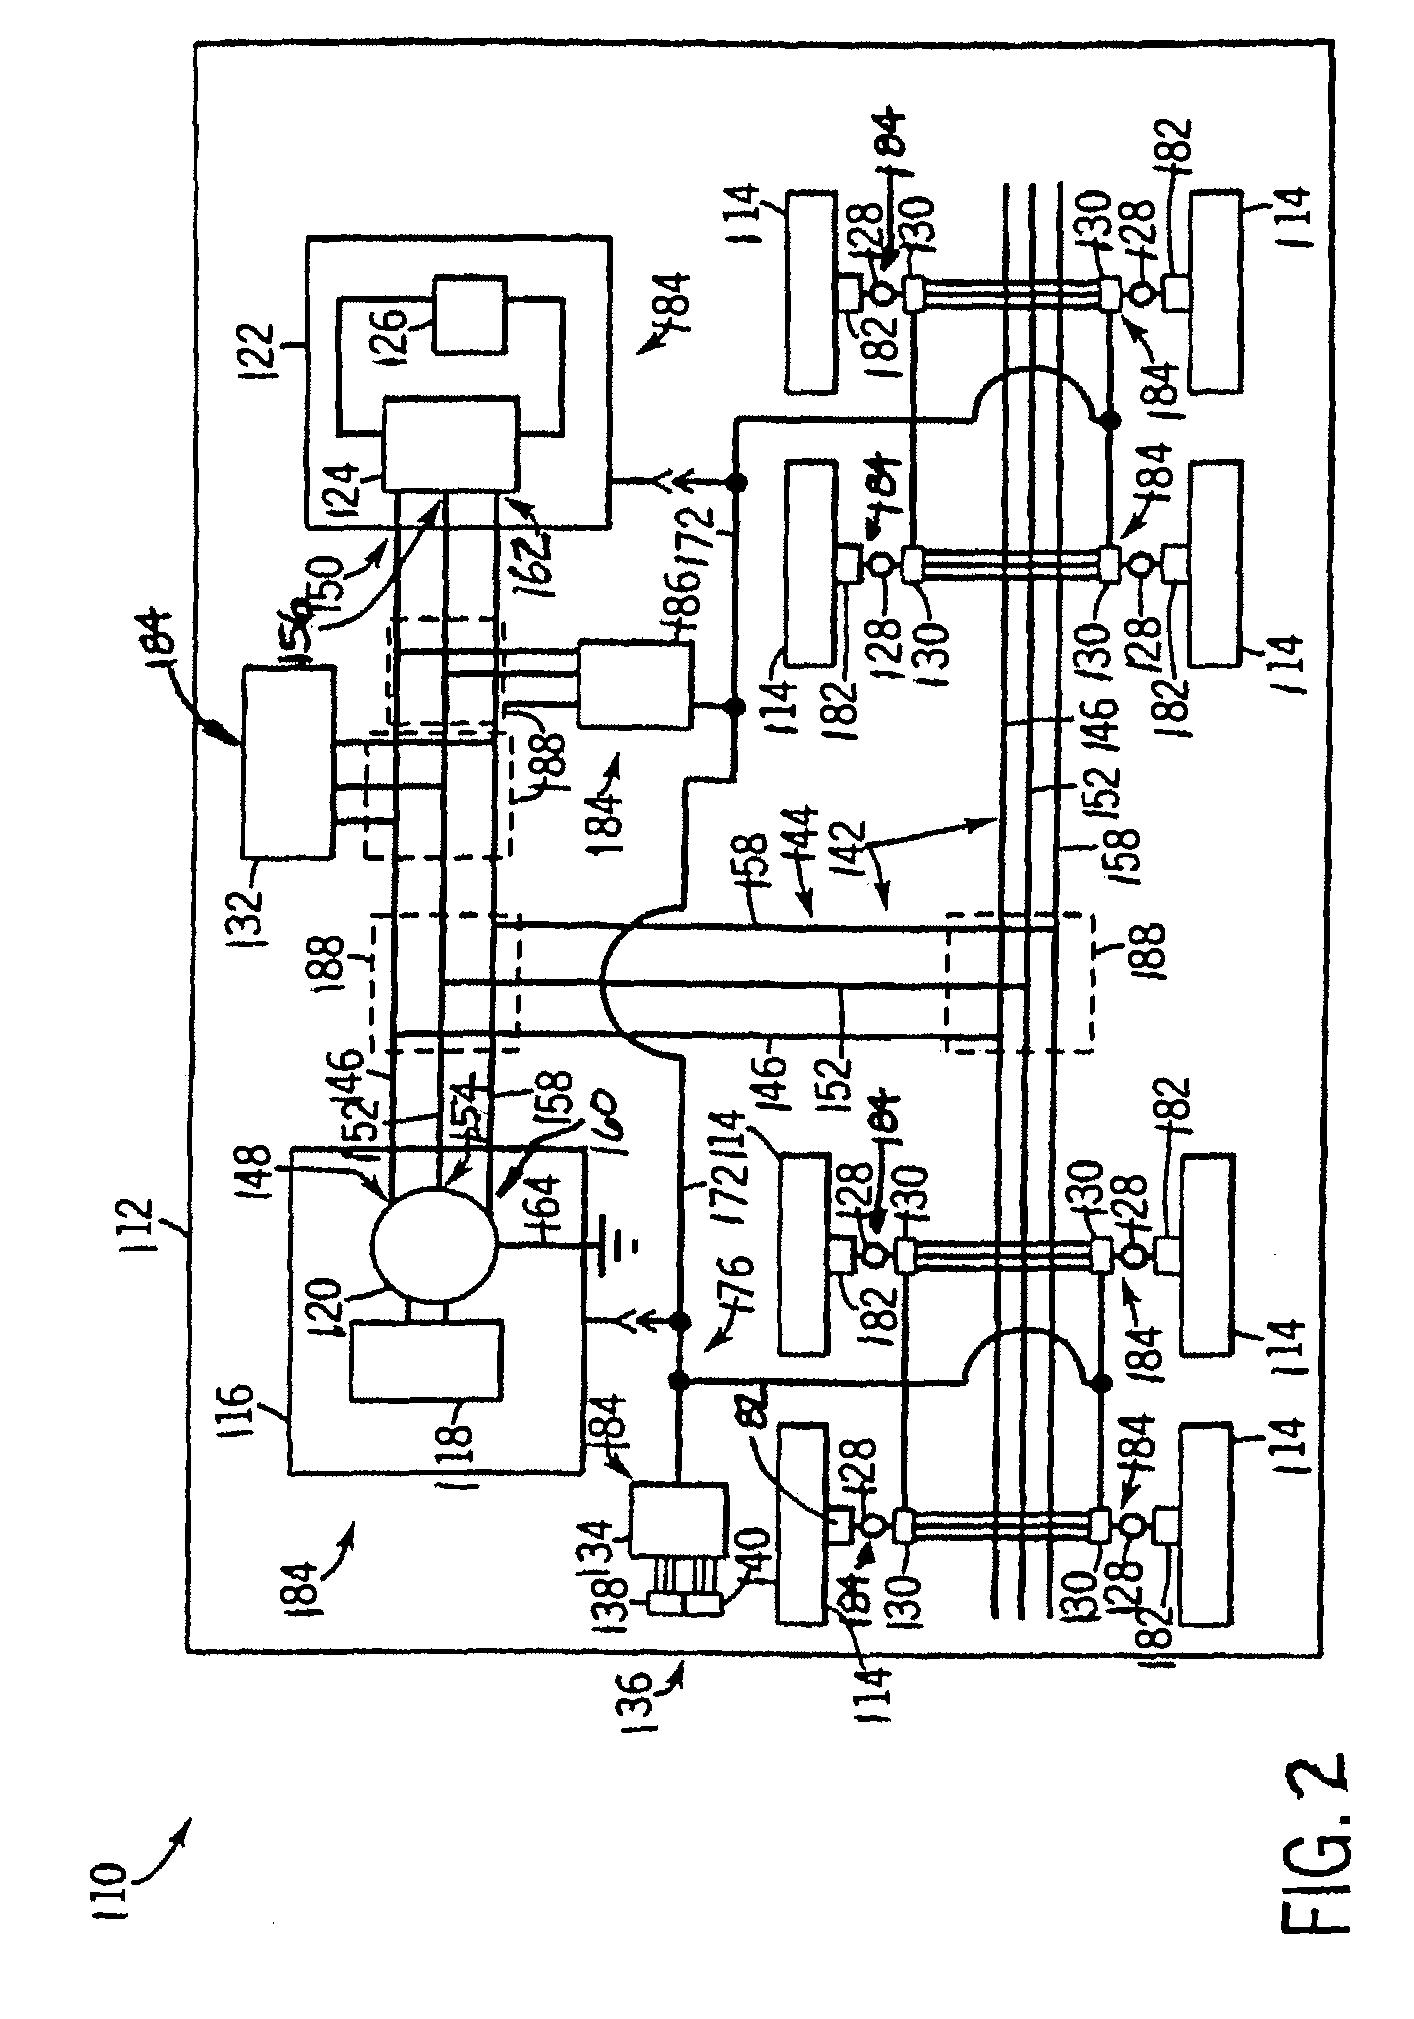 US07848857 20101207 D00002?resize=665%2C950 100 [ drag car wiring diagram how ] drag boat wiring diagram on fsh maglock wiring diagram at bayanpartner.co